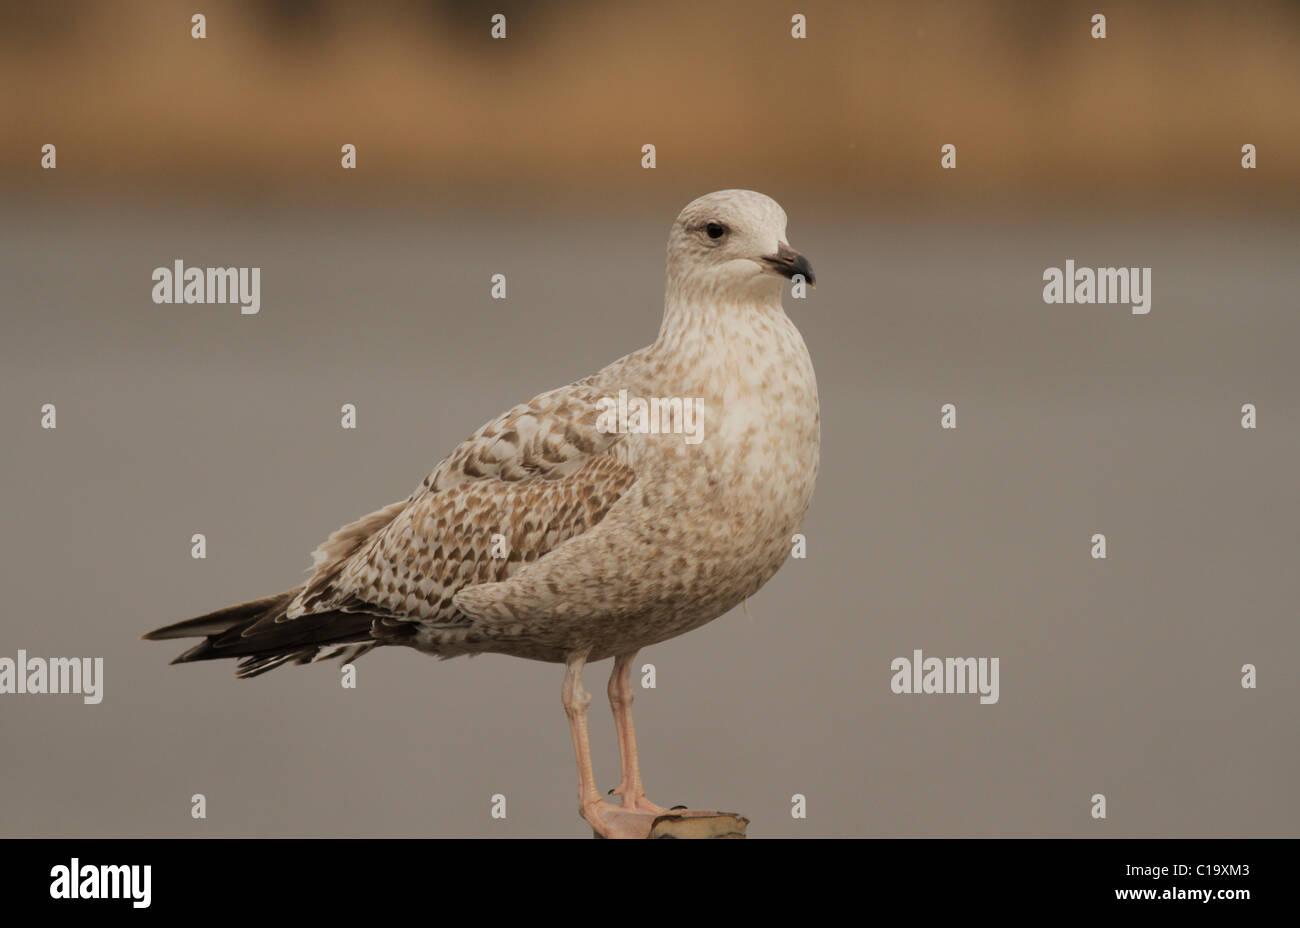 Juvenile Herring Gull Larus argentatus on post, Cornwall - Stock Image